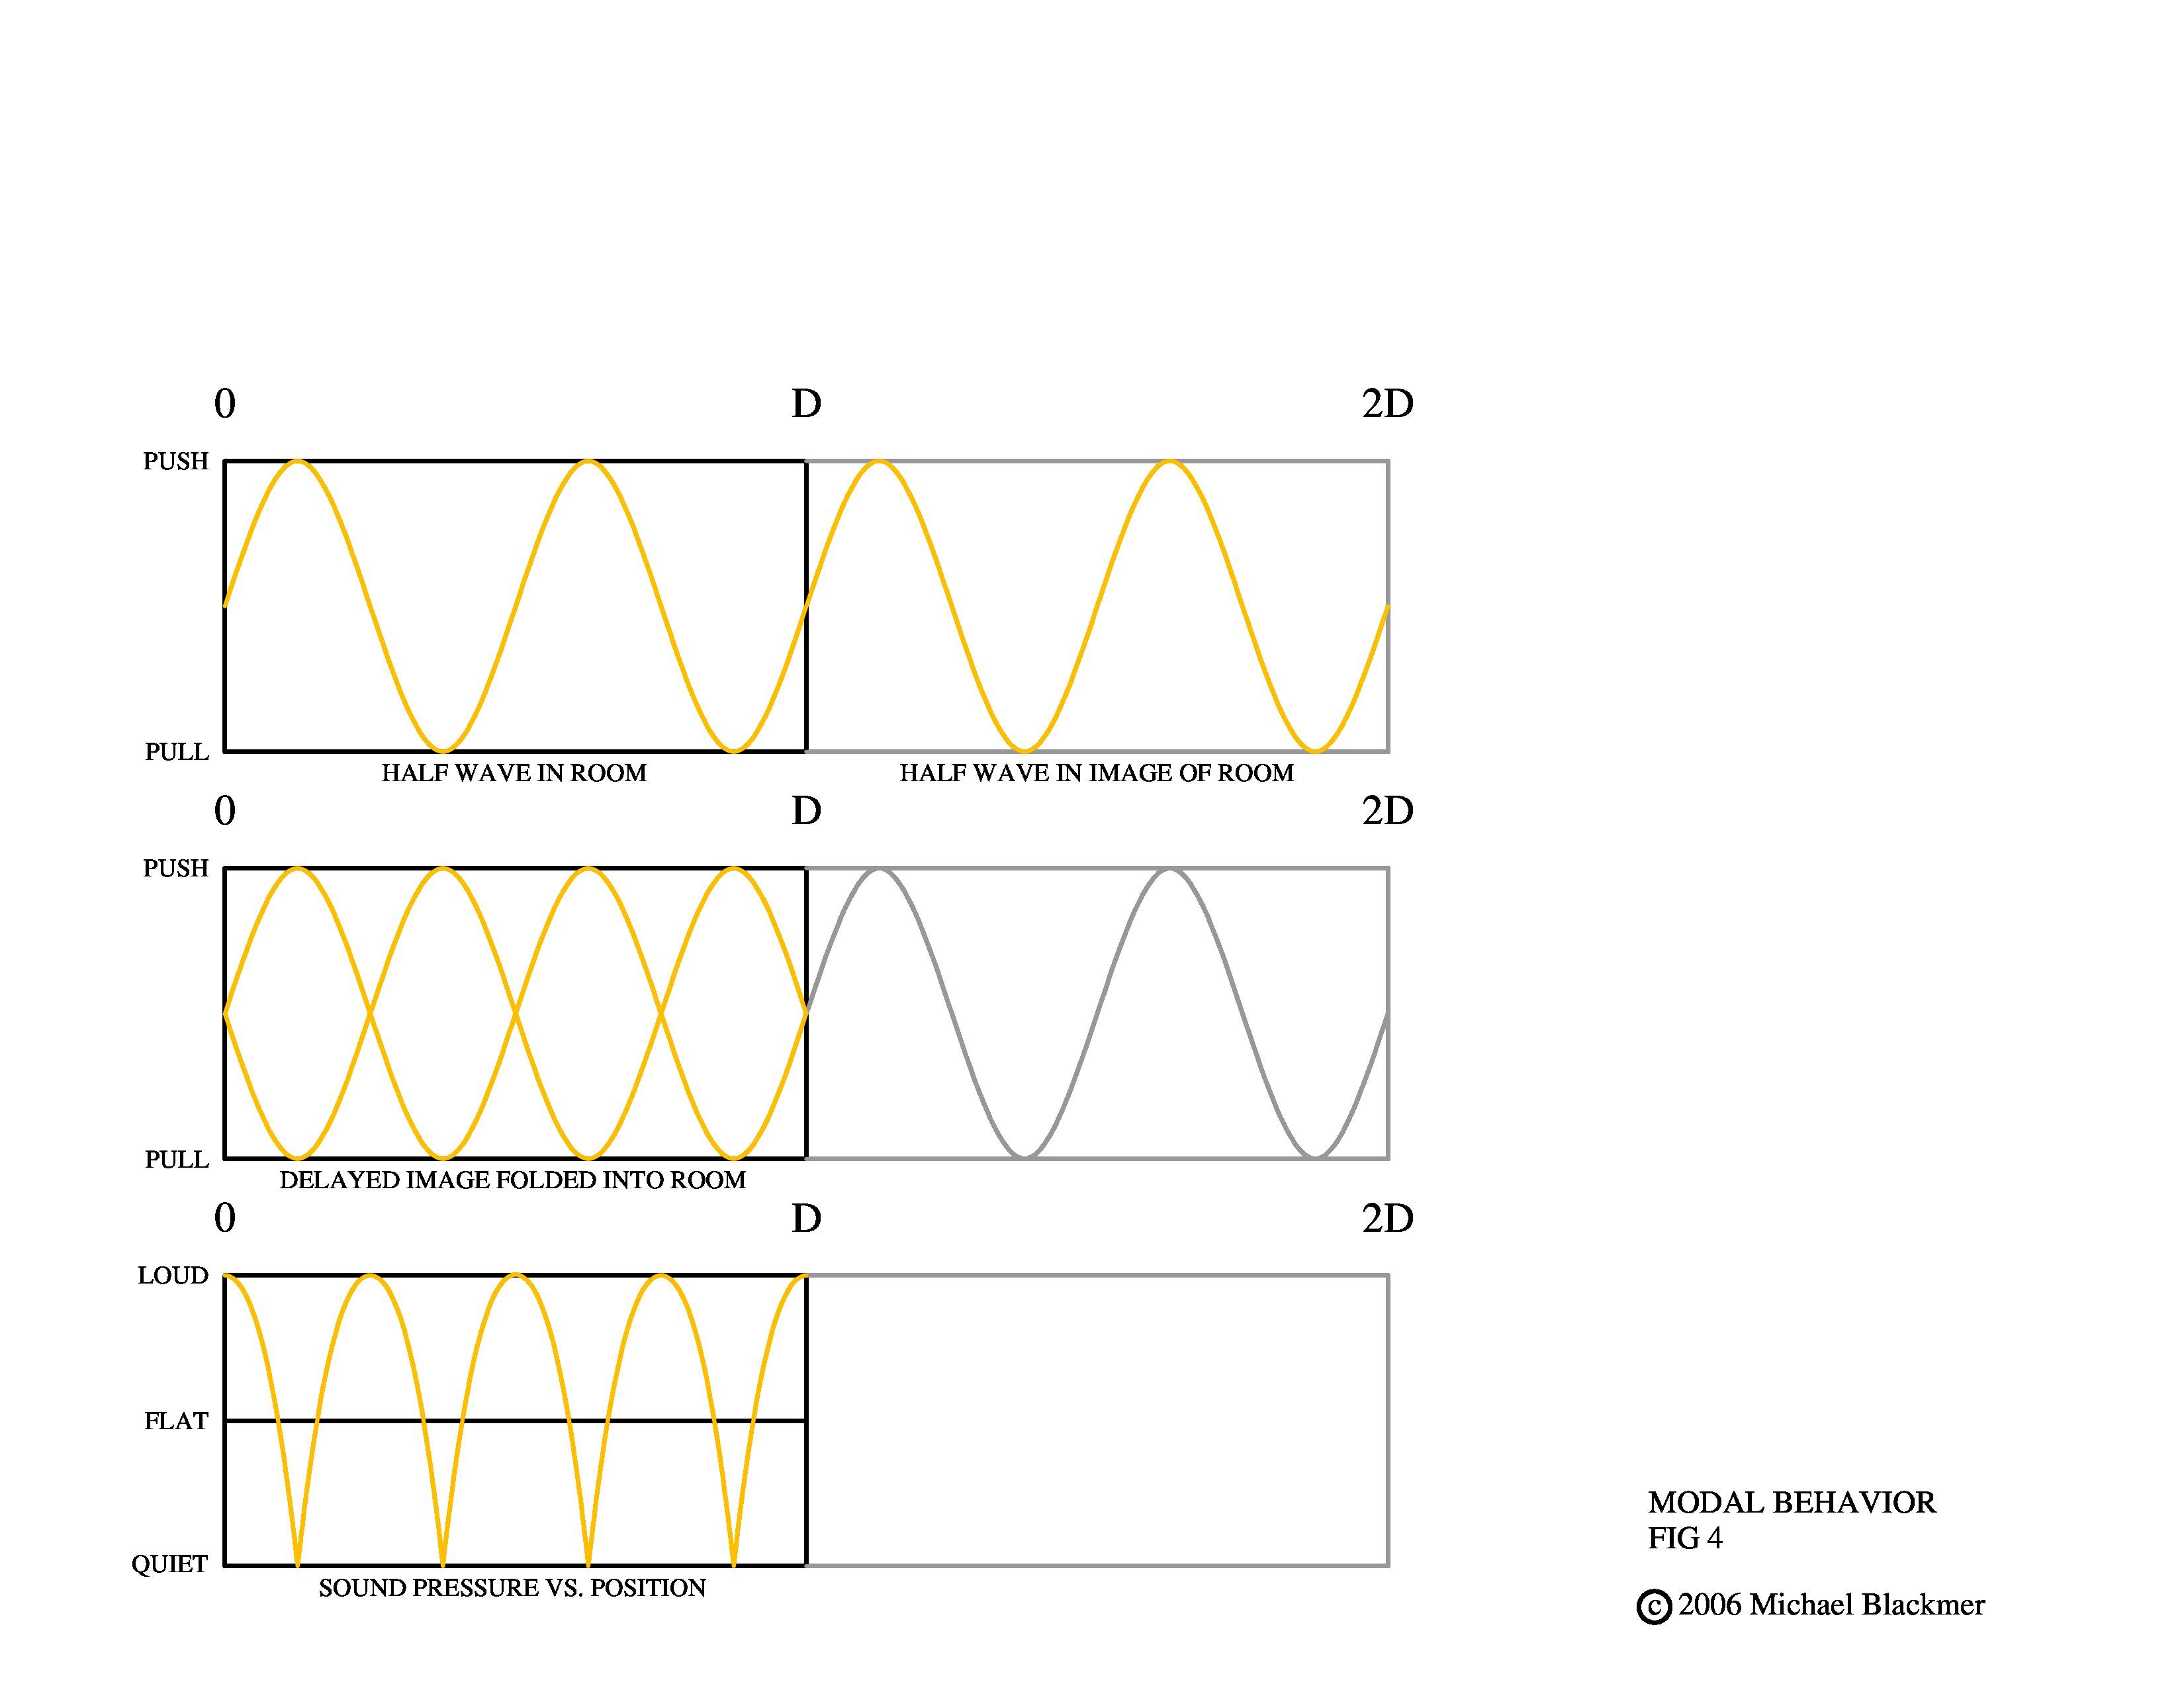 master-modal-behavior-demo-3-for-pad-fig-4-2-page-0